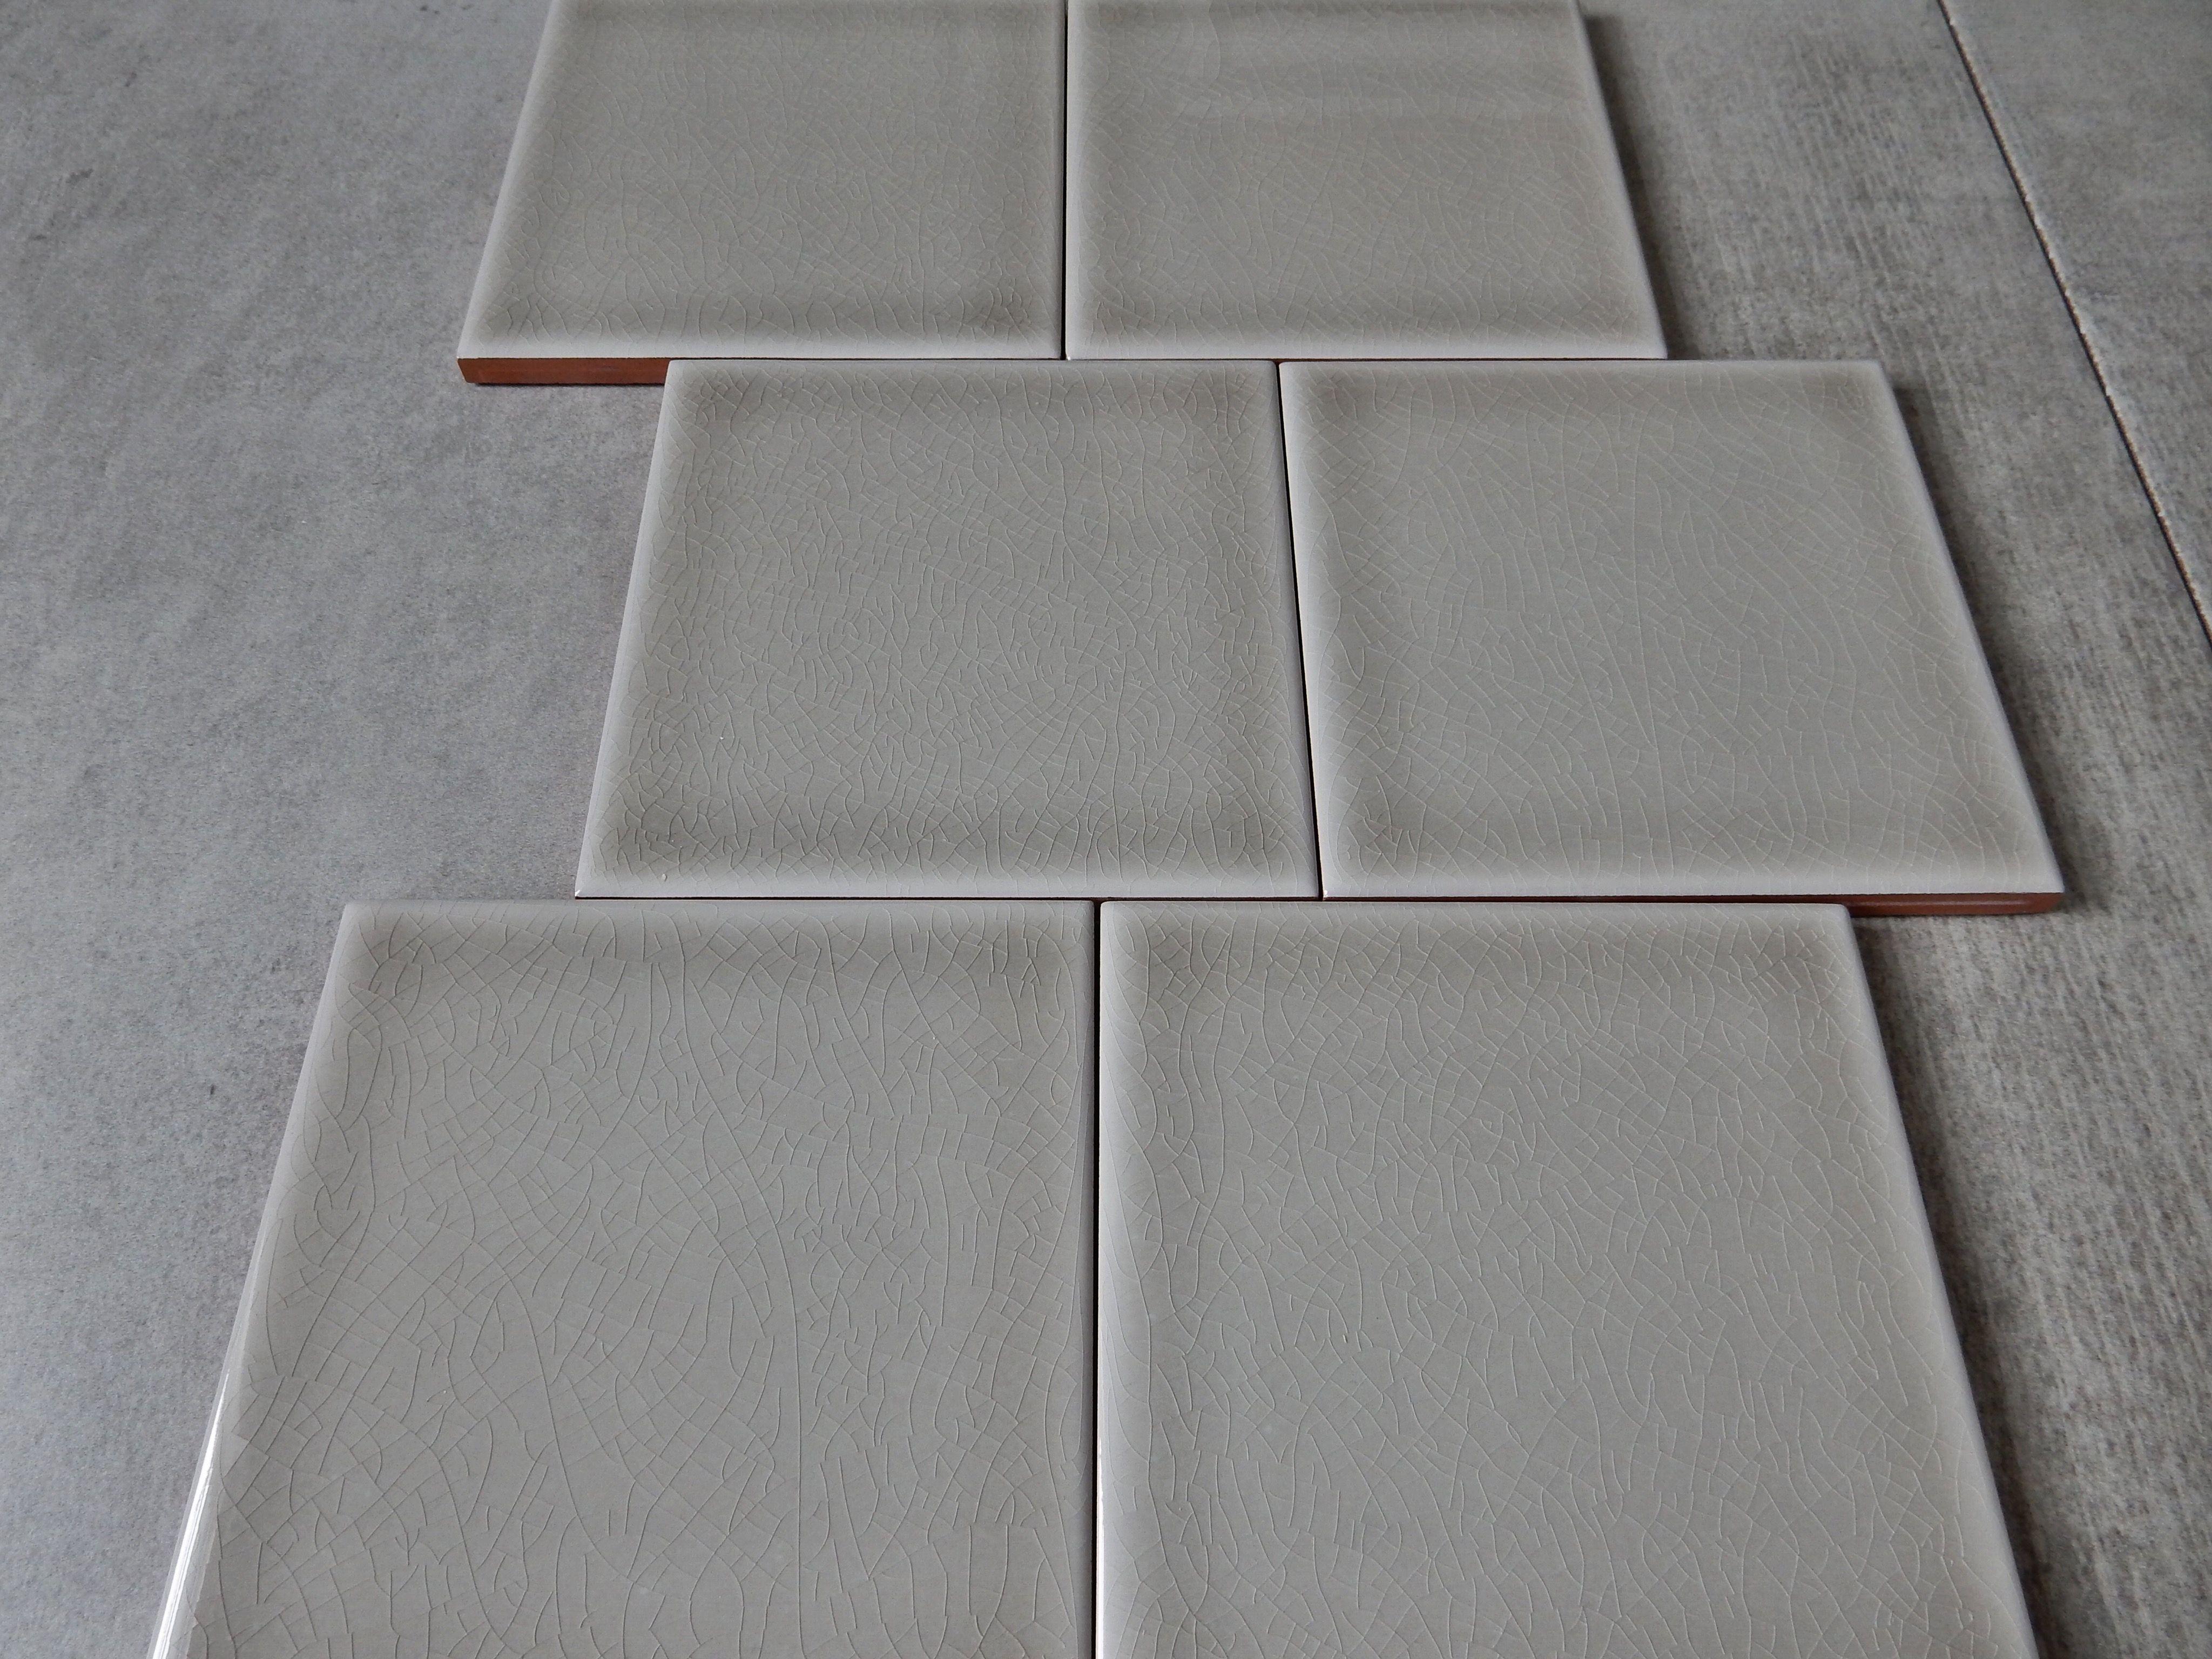 crackled effet grey square tile senio newport collection tiles